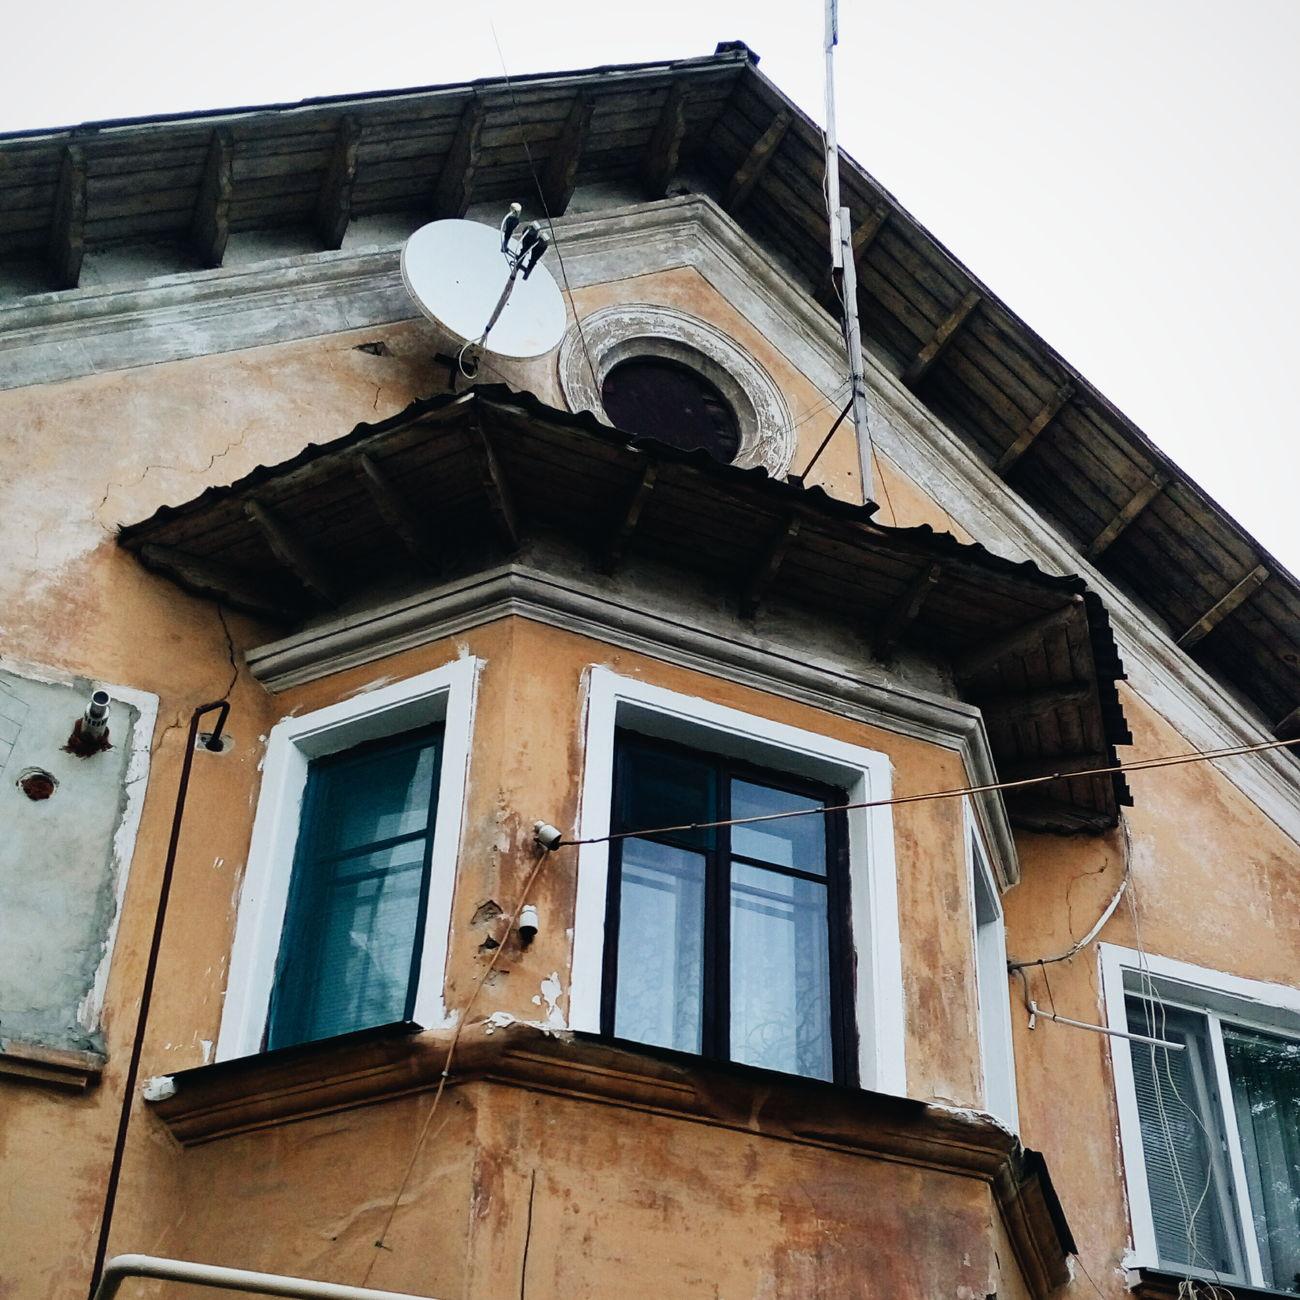 Meaw Old Building Dark Beautiful Ukraine